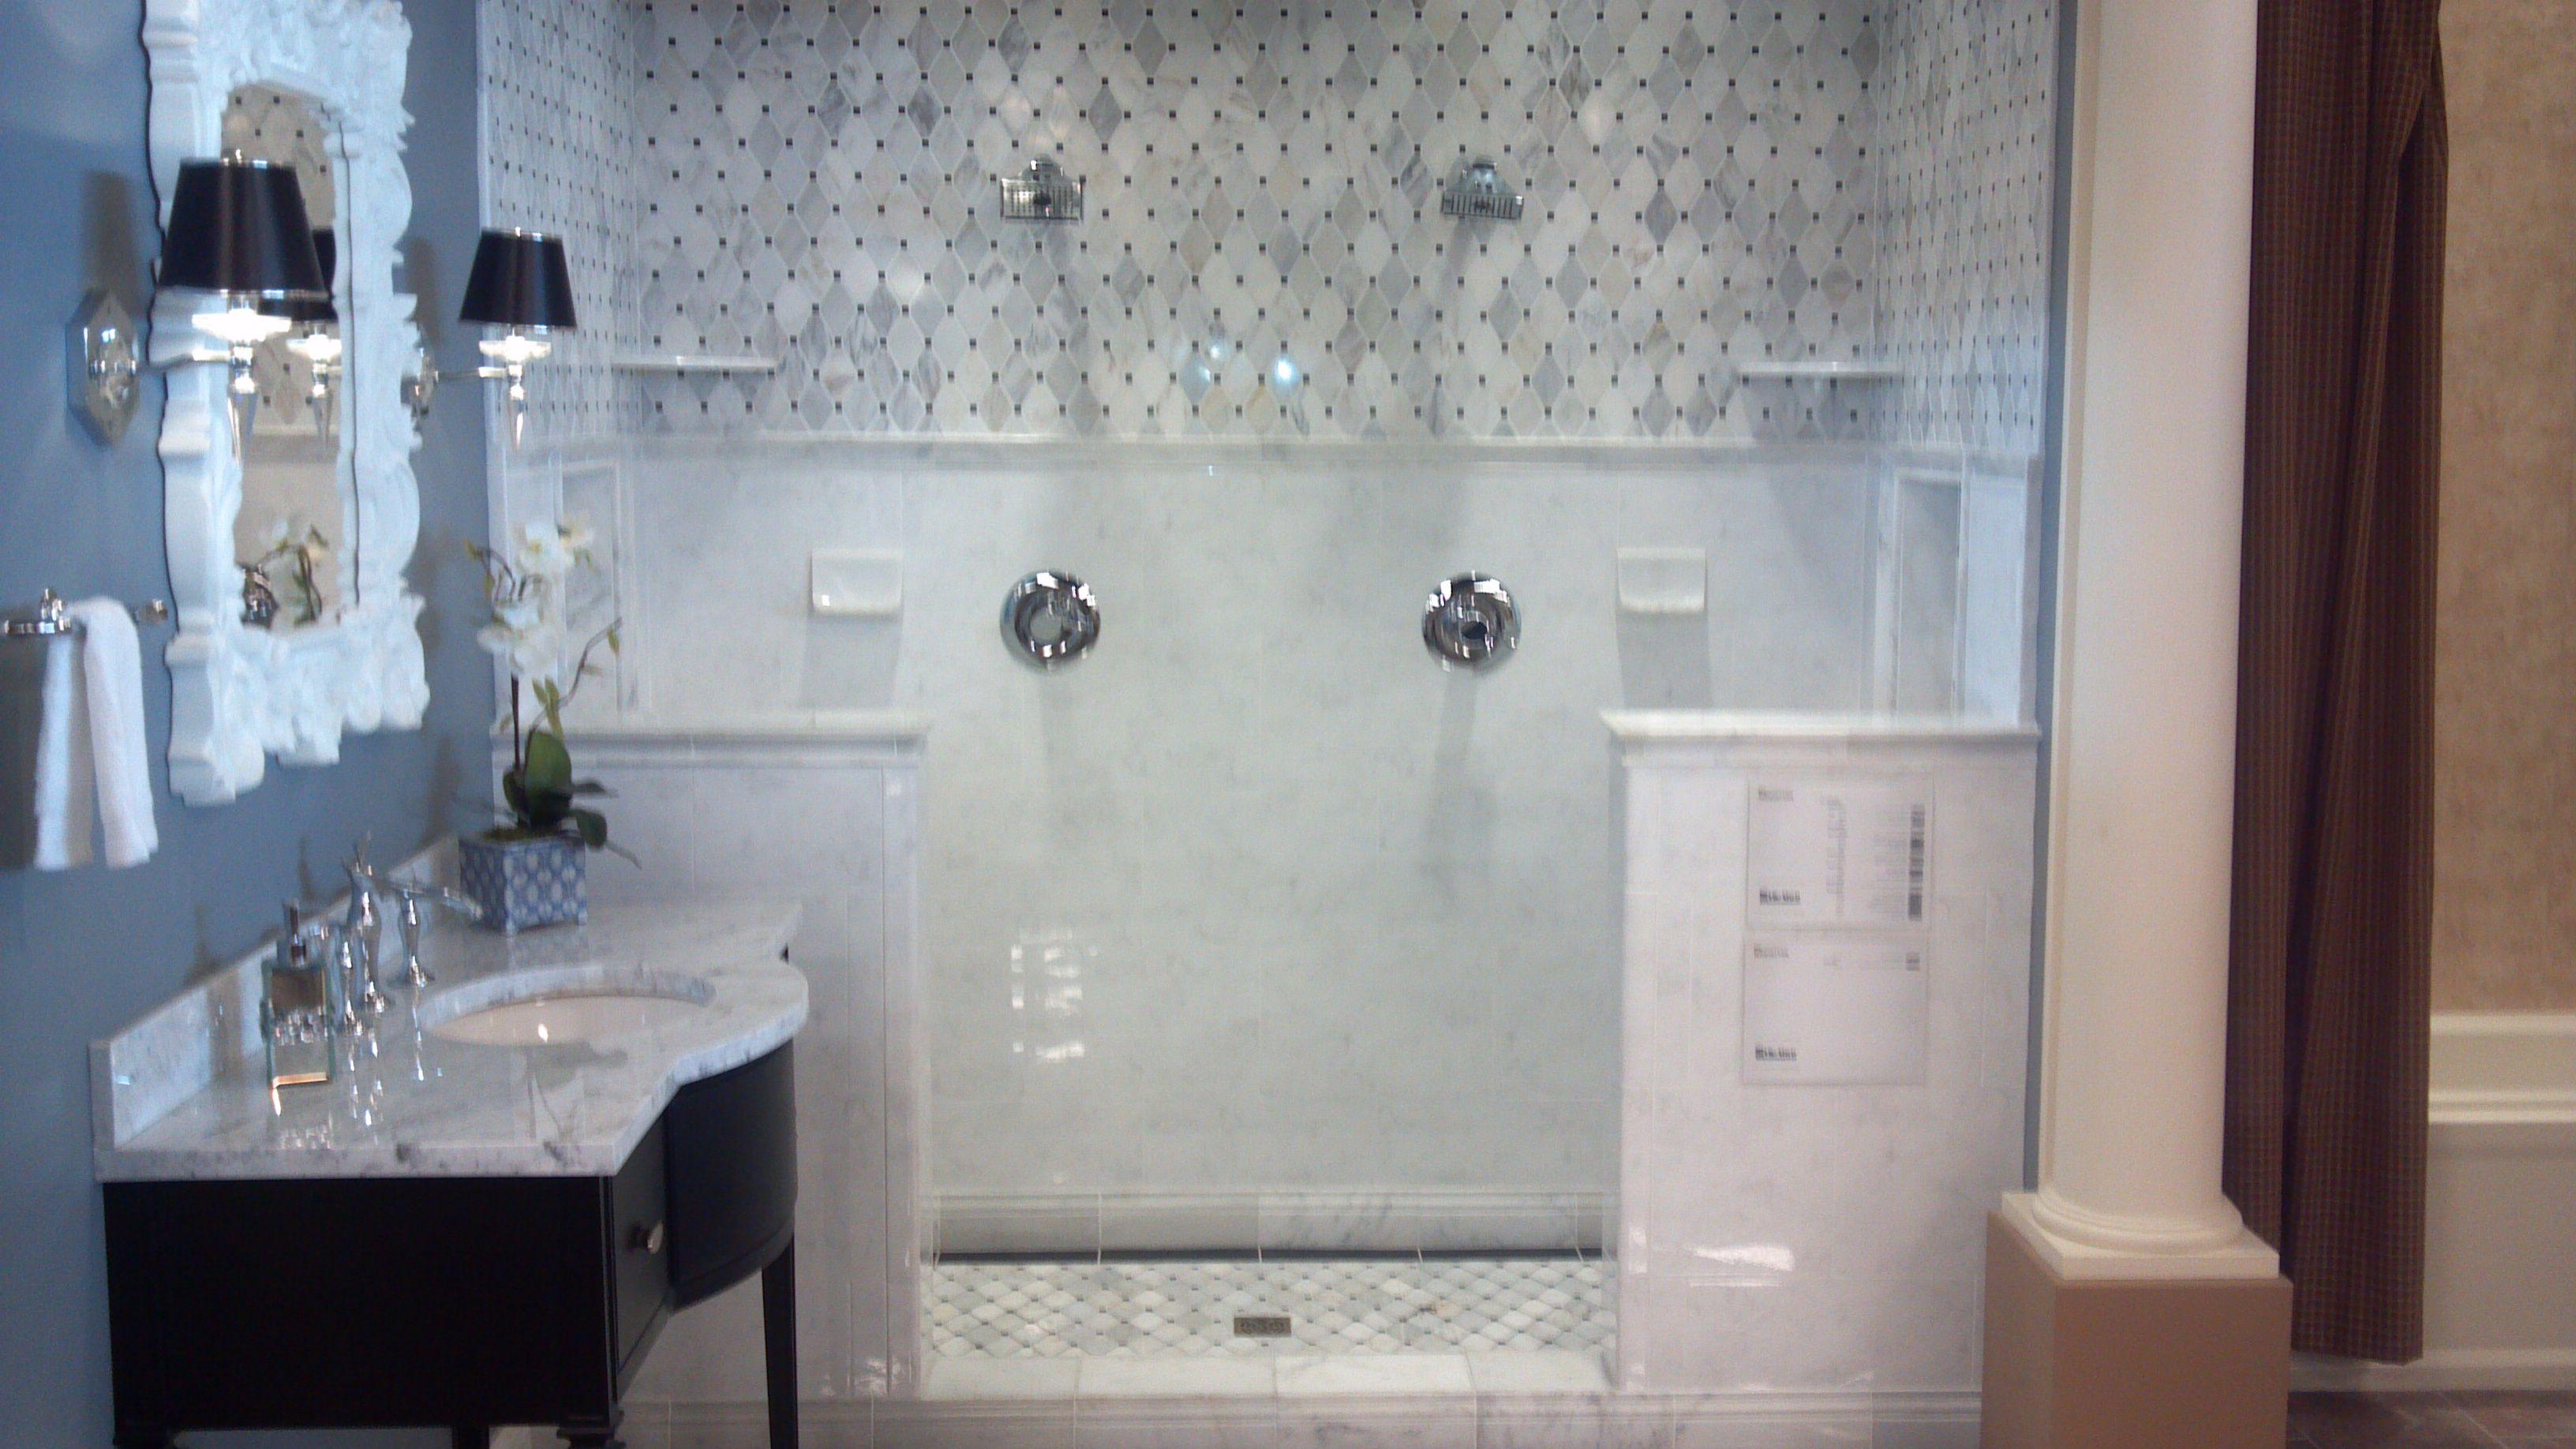 small bathroom ideas pinterest car interior design. Black Bedroom Furniture Sets. Home Design Ideas